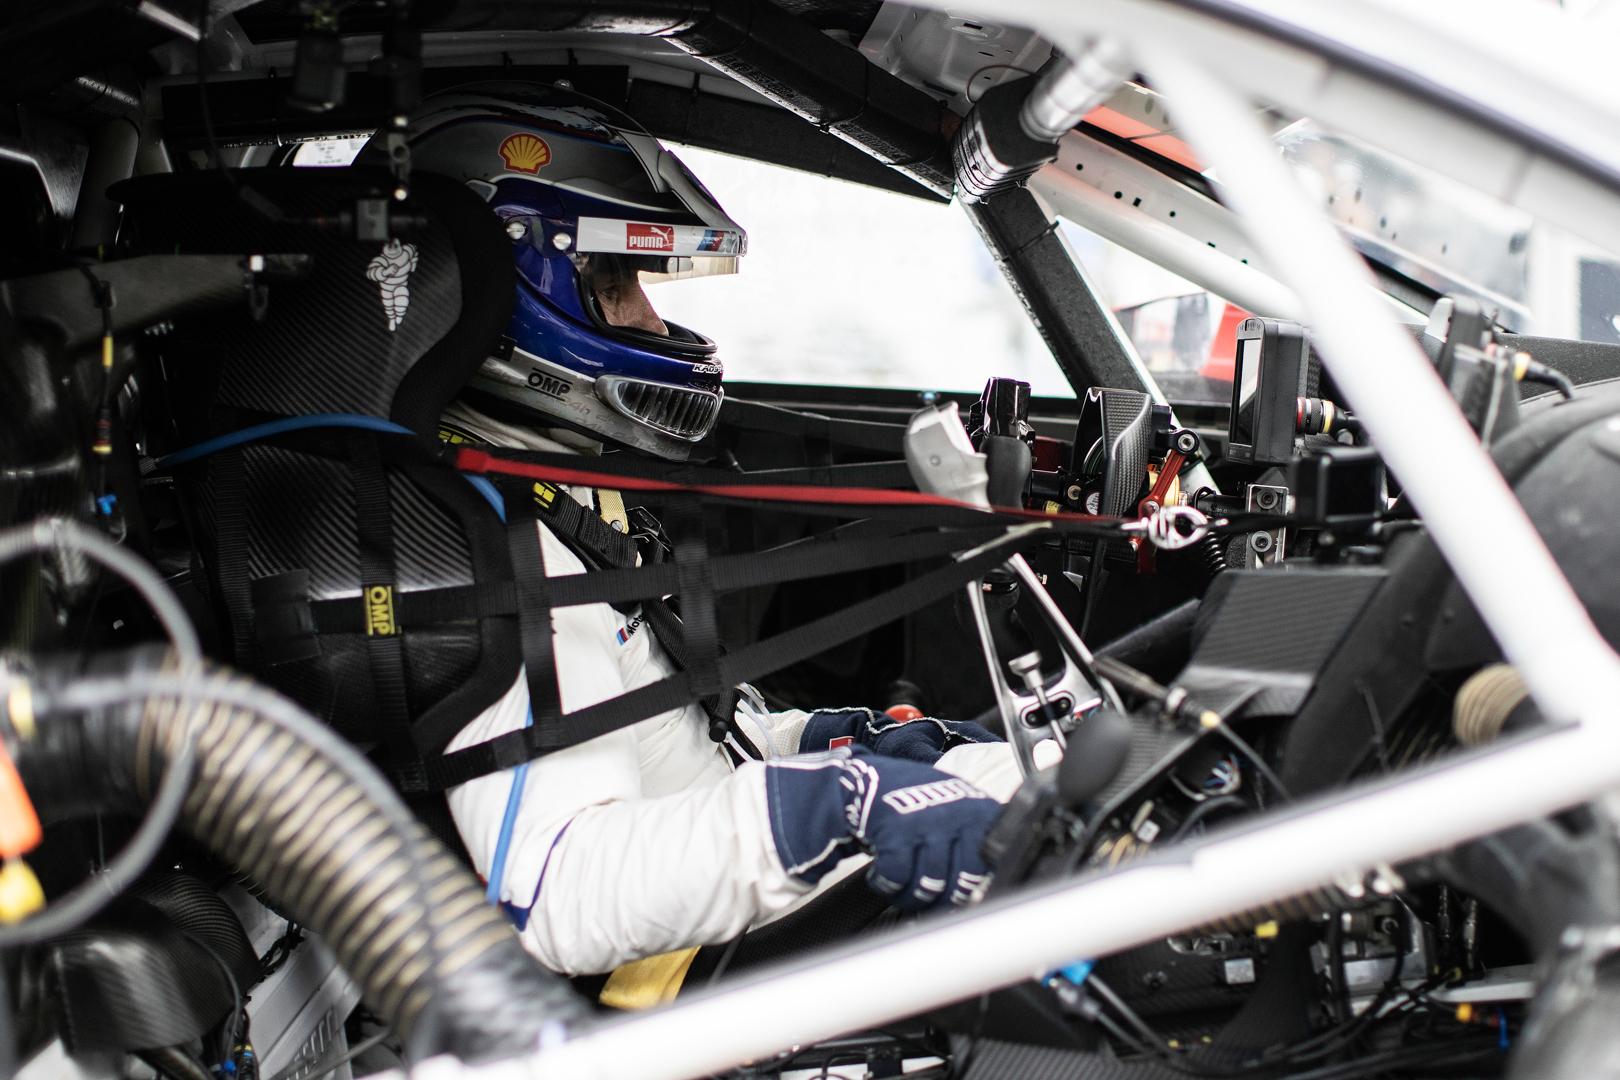 The partnership between BMW Motorsport and Alex Zanardi is incredible